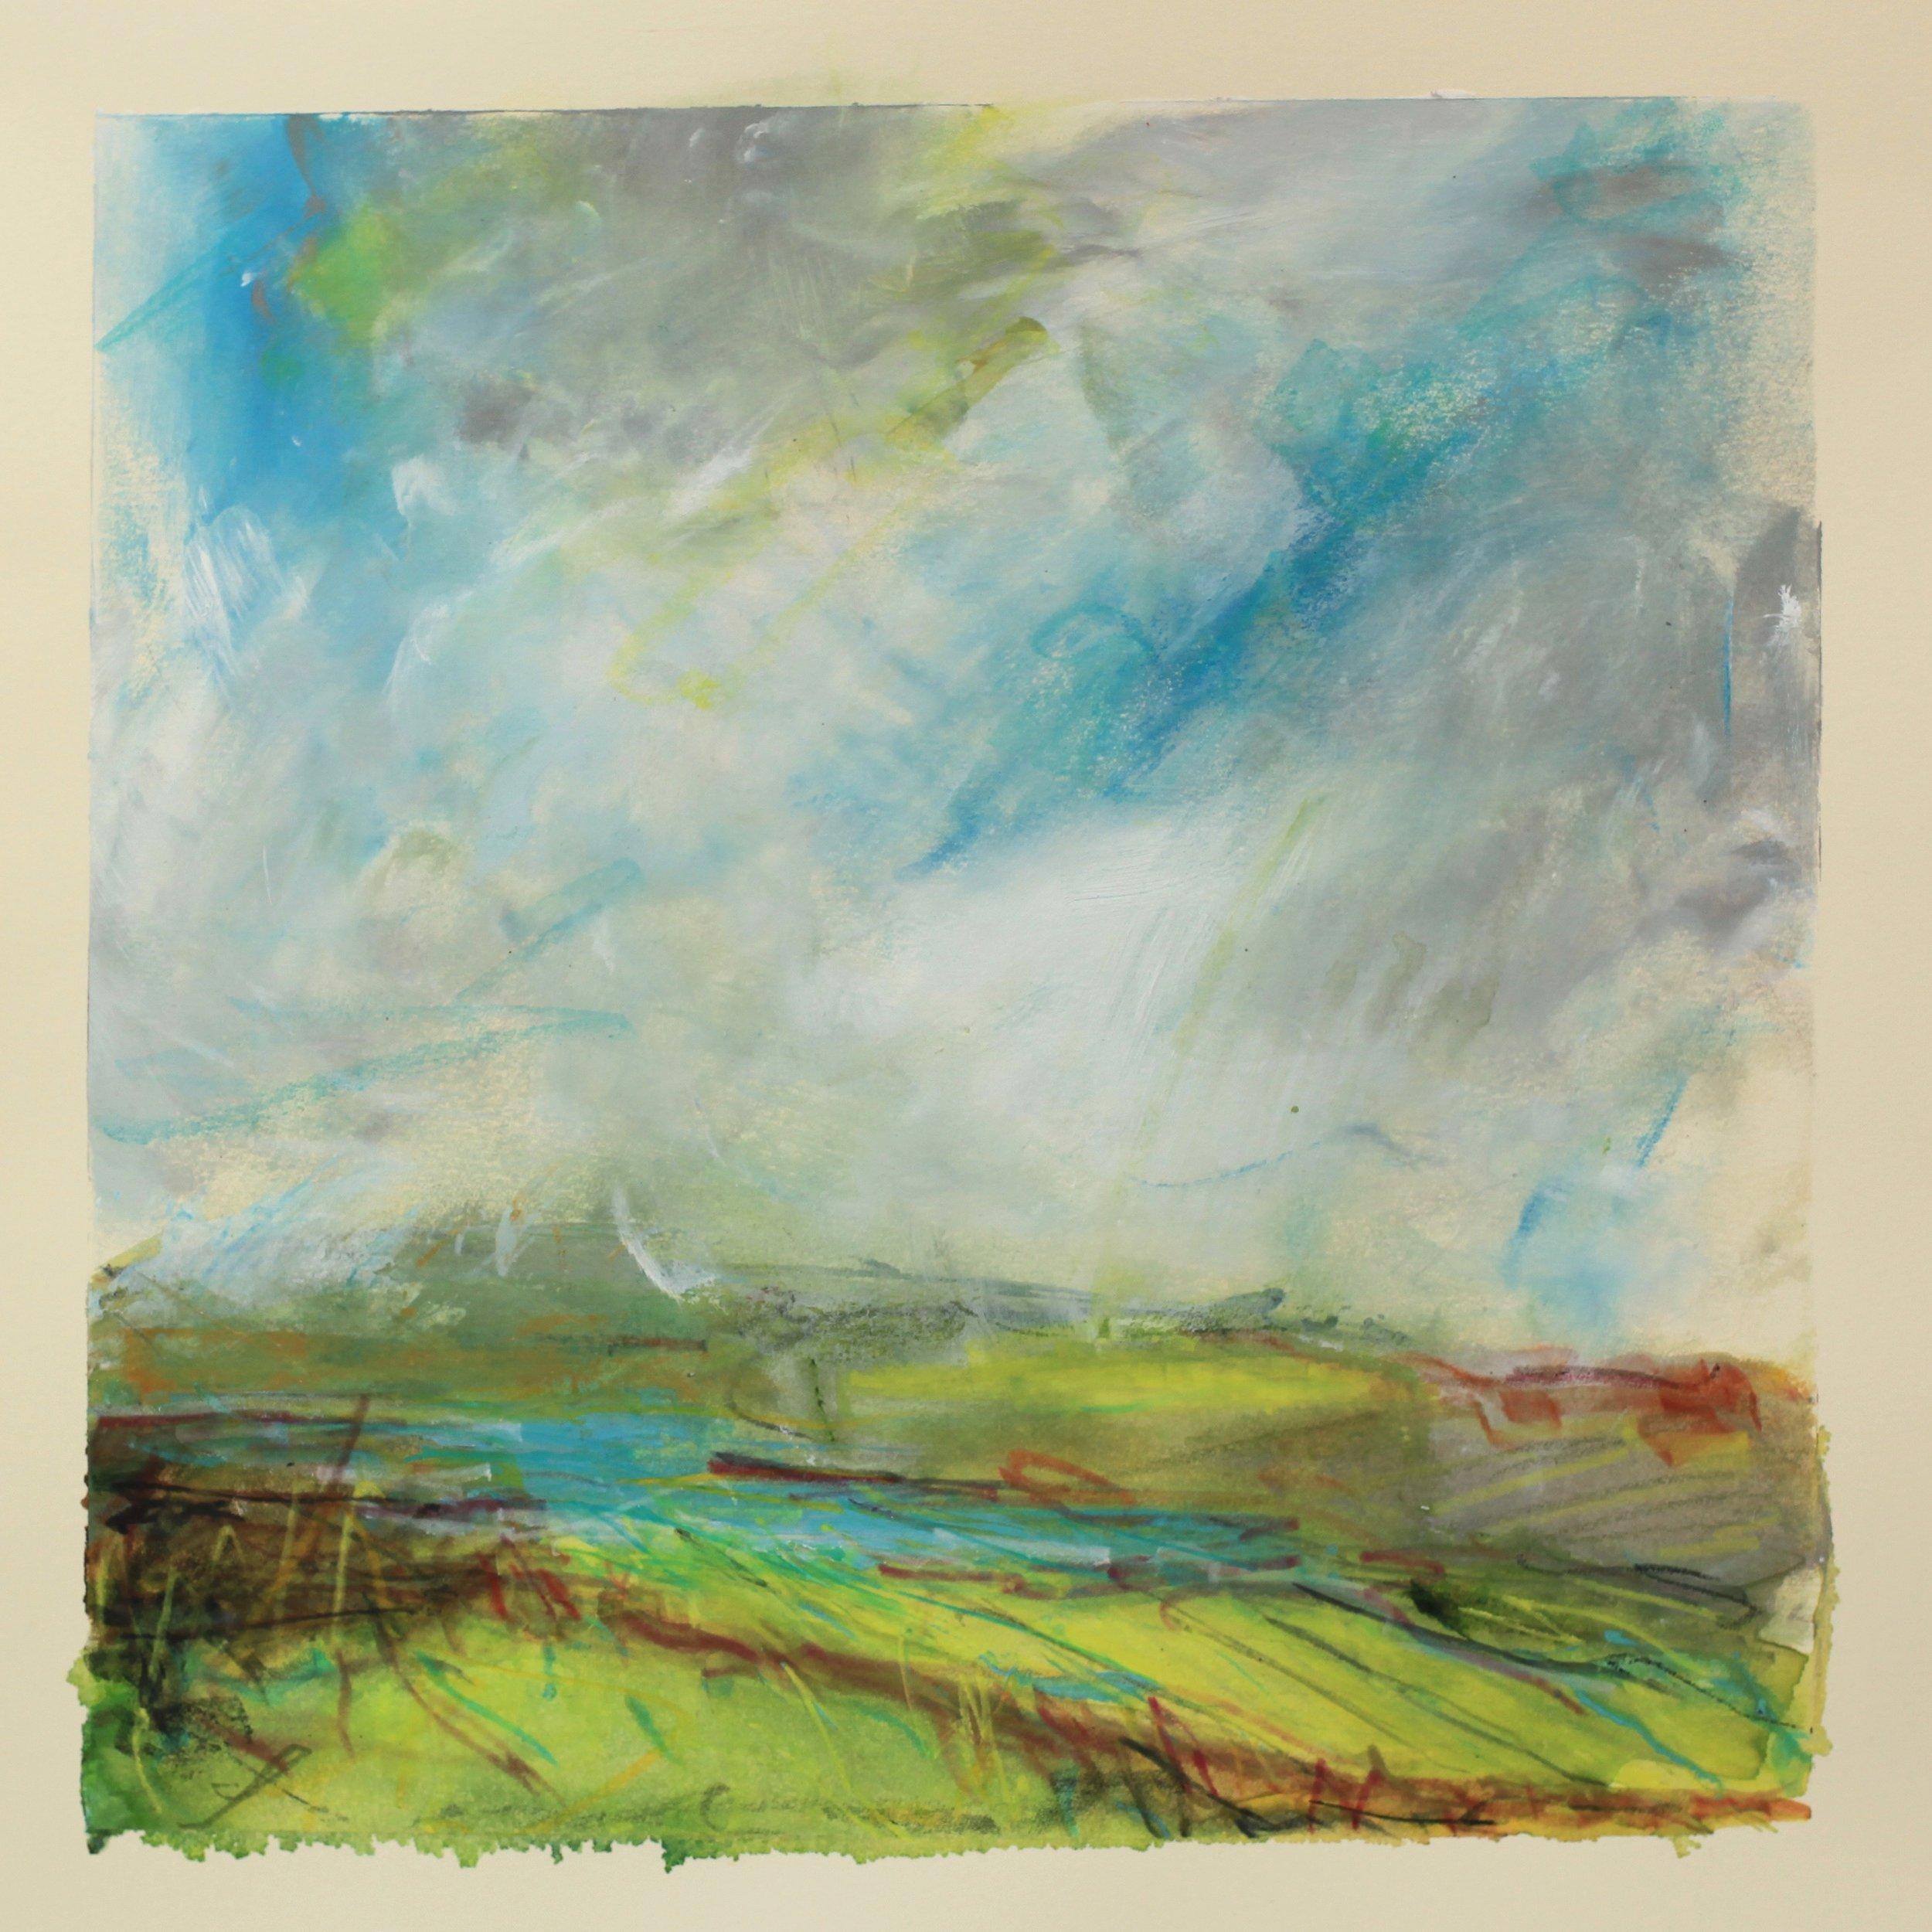 Green fields, watercolour, 28 x 28cm